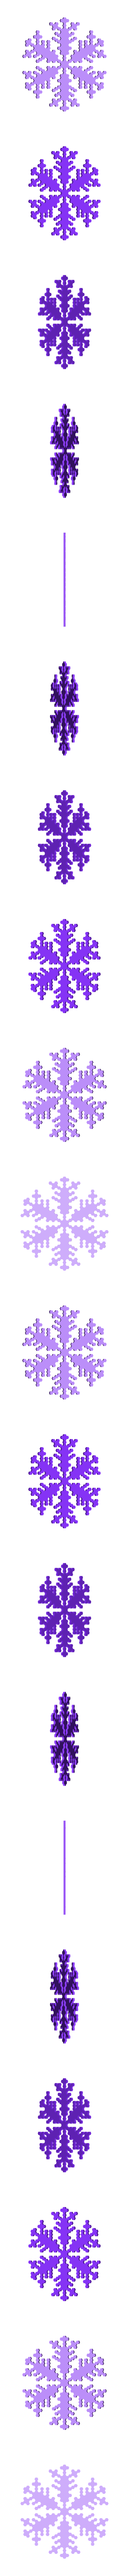 reiter20-1.6-0.7-0.002-50.stl Download free STL file Snowflake growth simulation in BlocksCAD • 3D printing design, arpruss